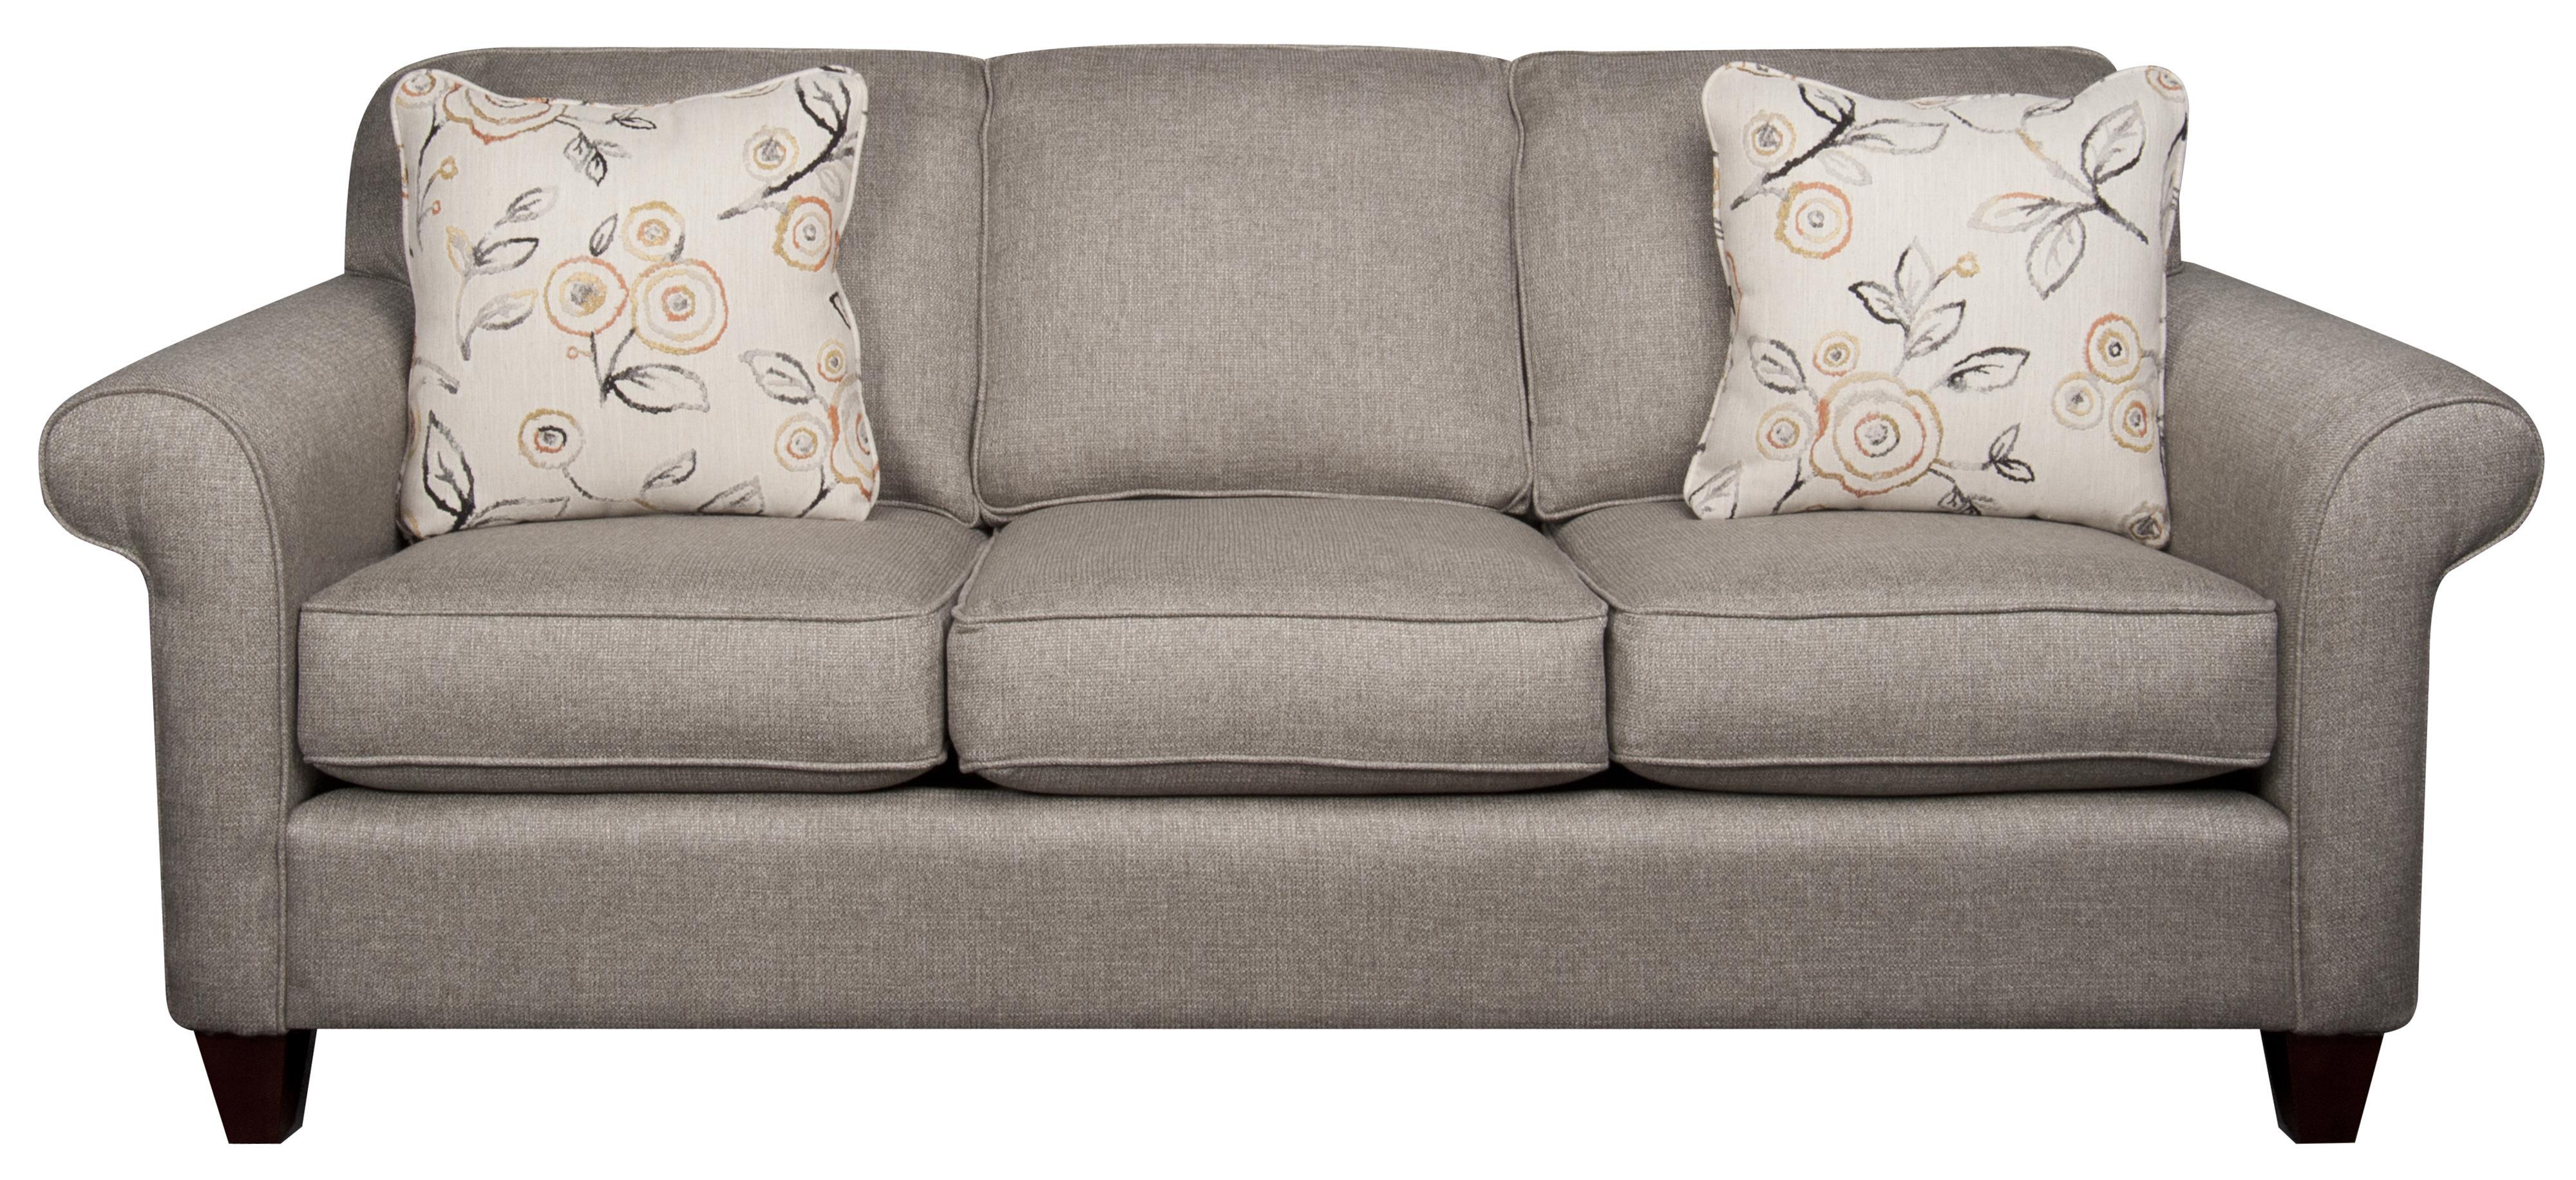 Sarah Sarah Revolution Fabric Sofa by Craftmaster at Morris Home